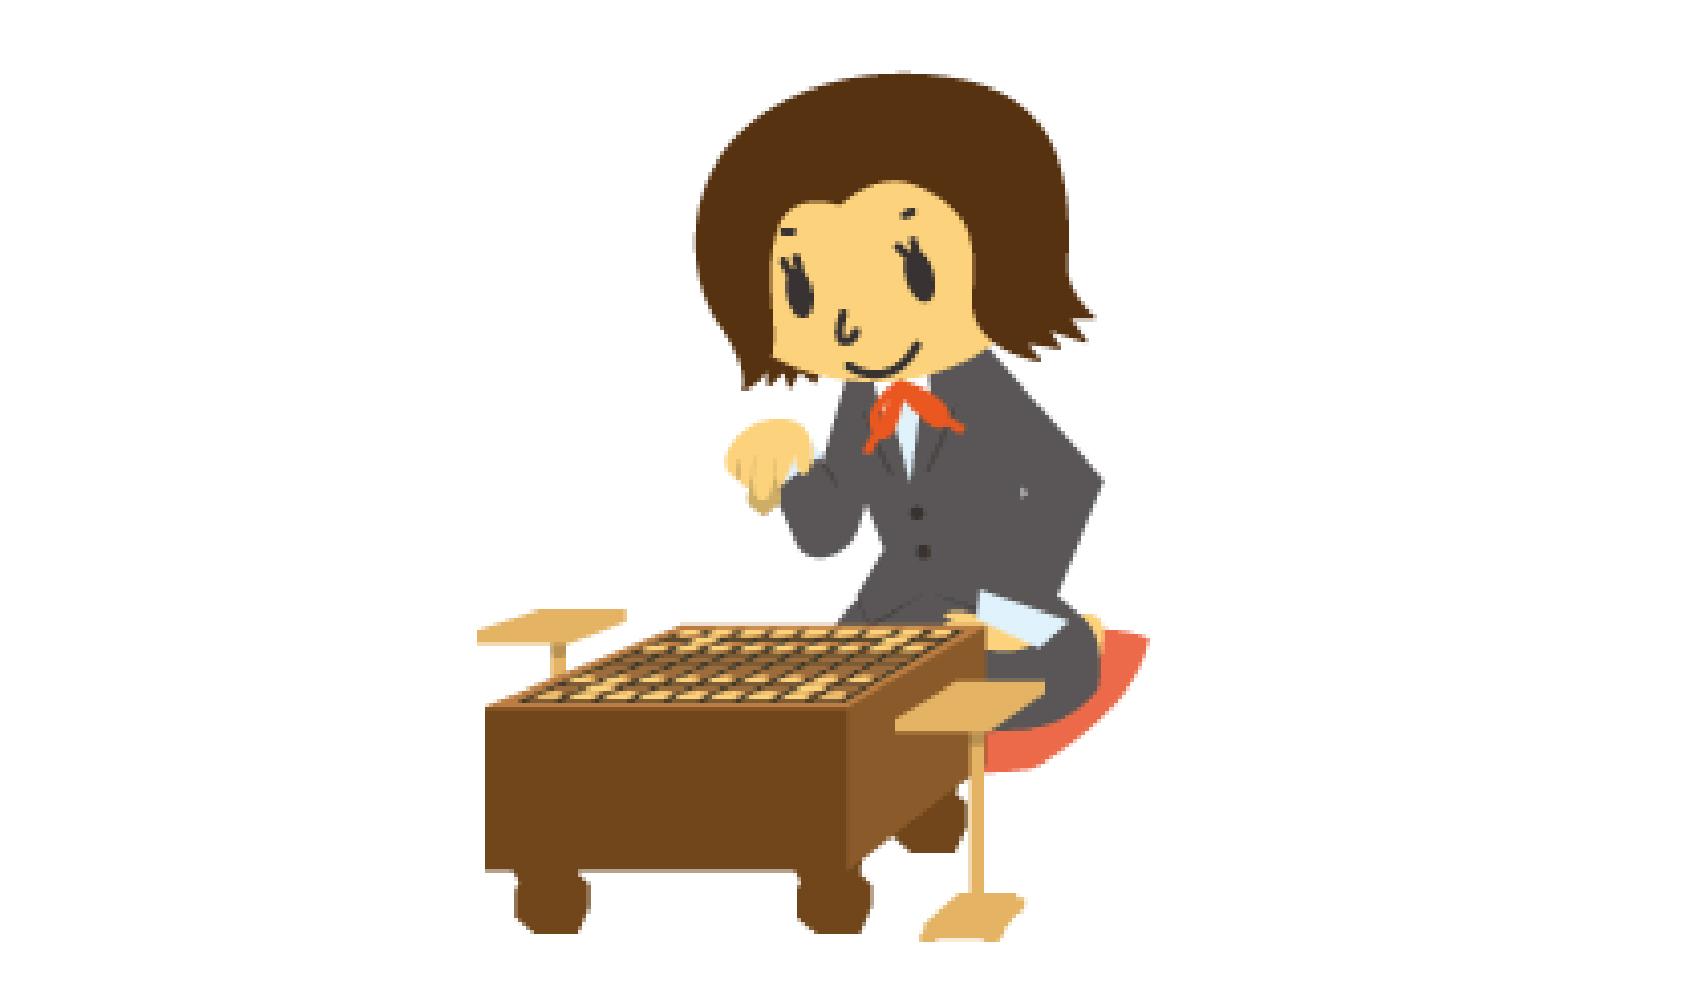 プロ棋士(きし)